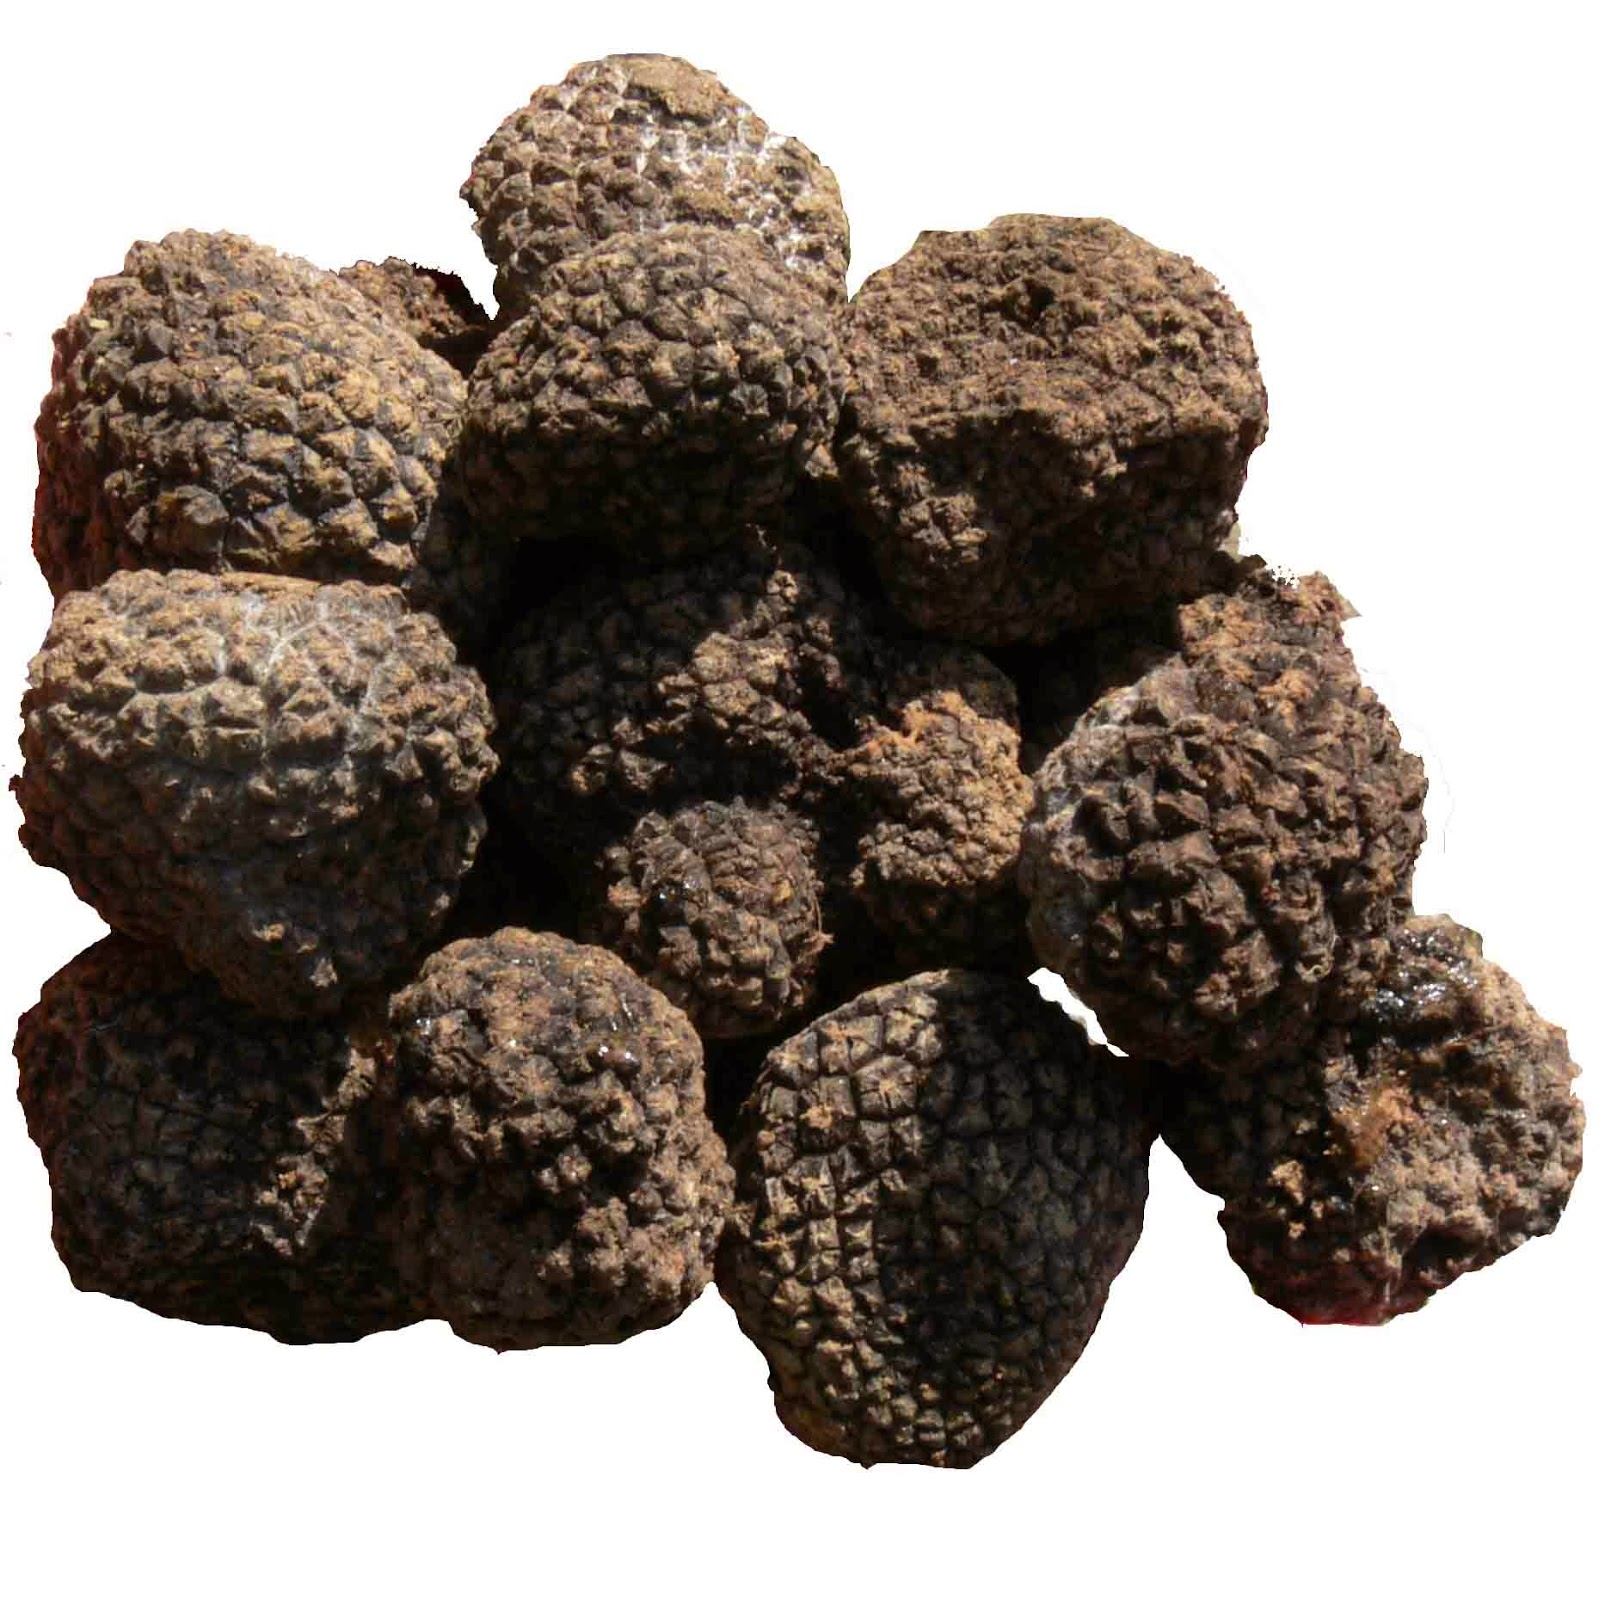 truffle-juice-vs-truffle-oil